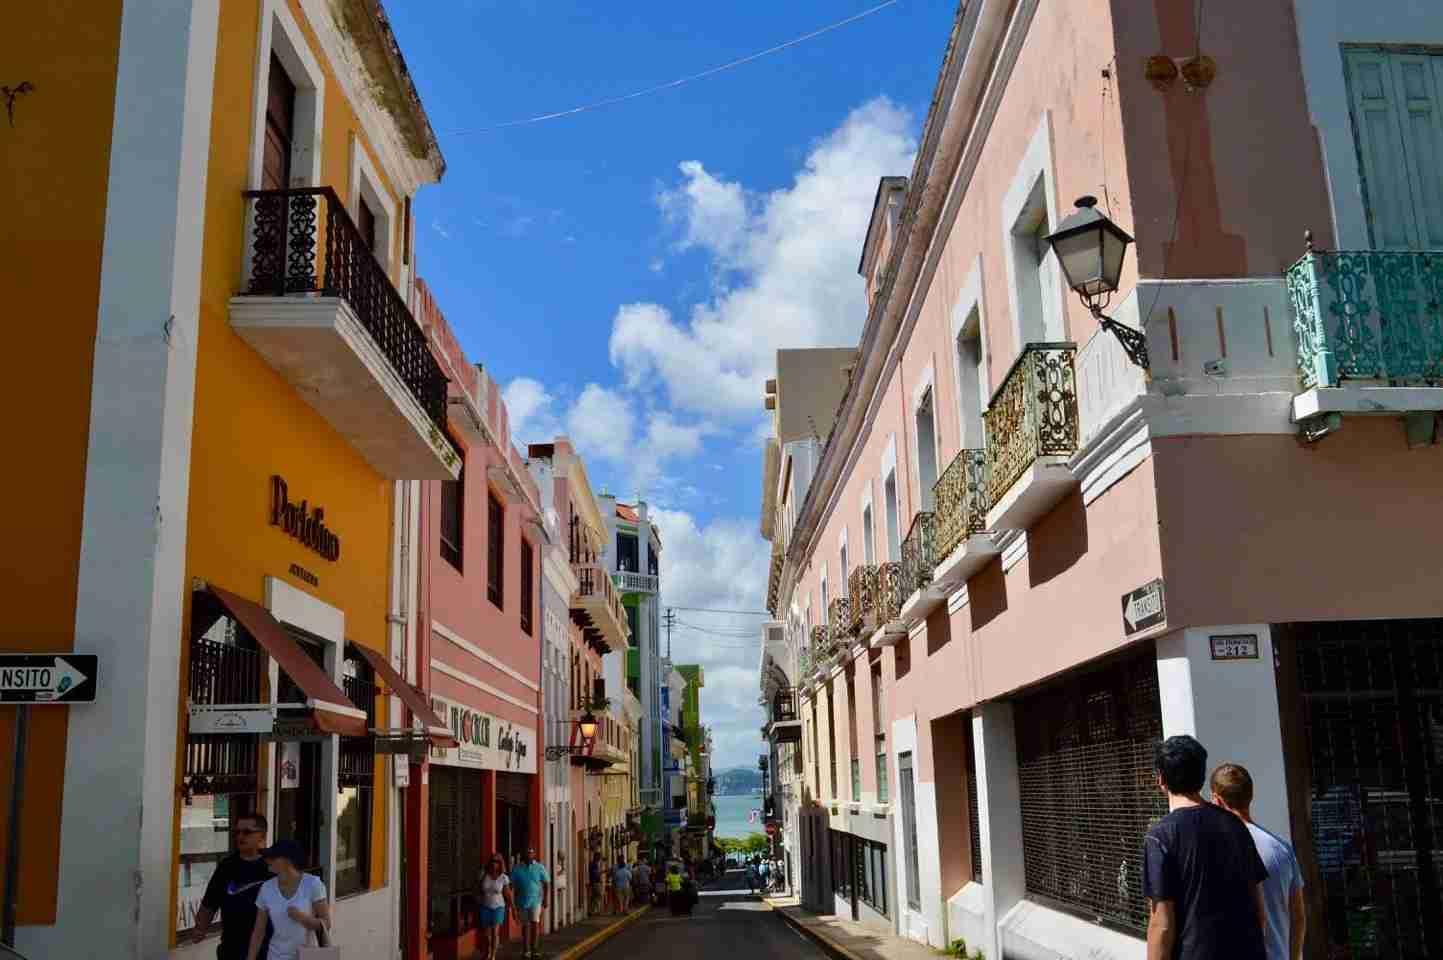 San Juan, Puerto Rico.(Photo by Liz Hund/TPG)